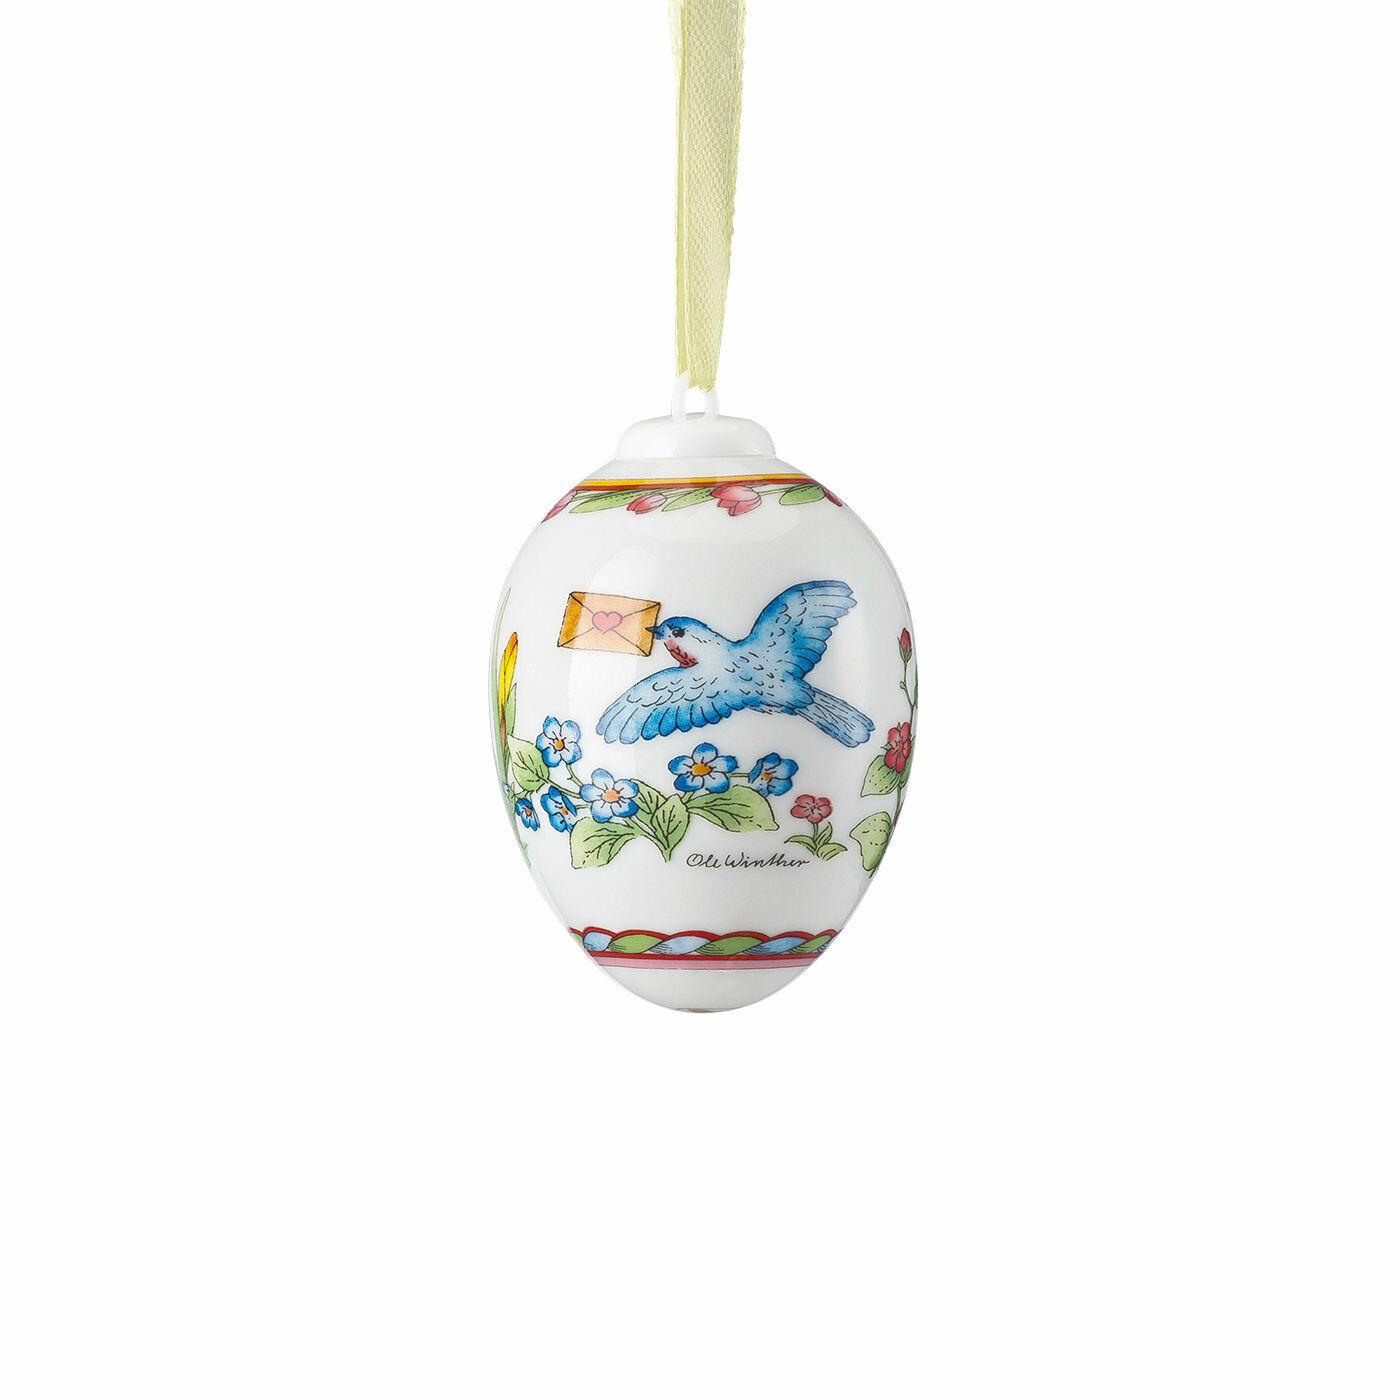 Porzellan-Ei - Das Ei 2017 - Hutschenreuther - 02254-723934-27957 Frühlingsgruß